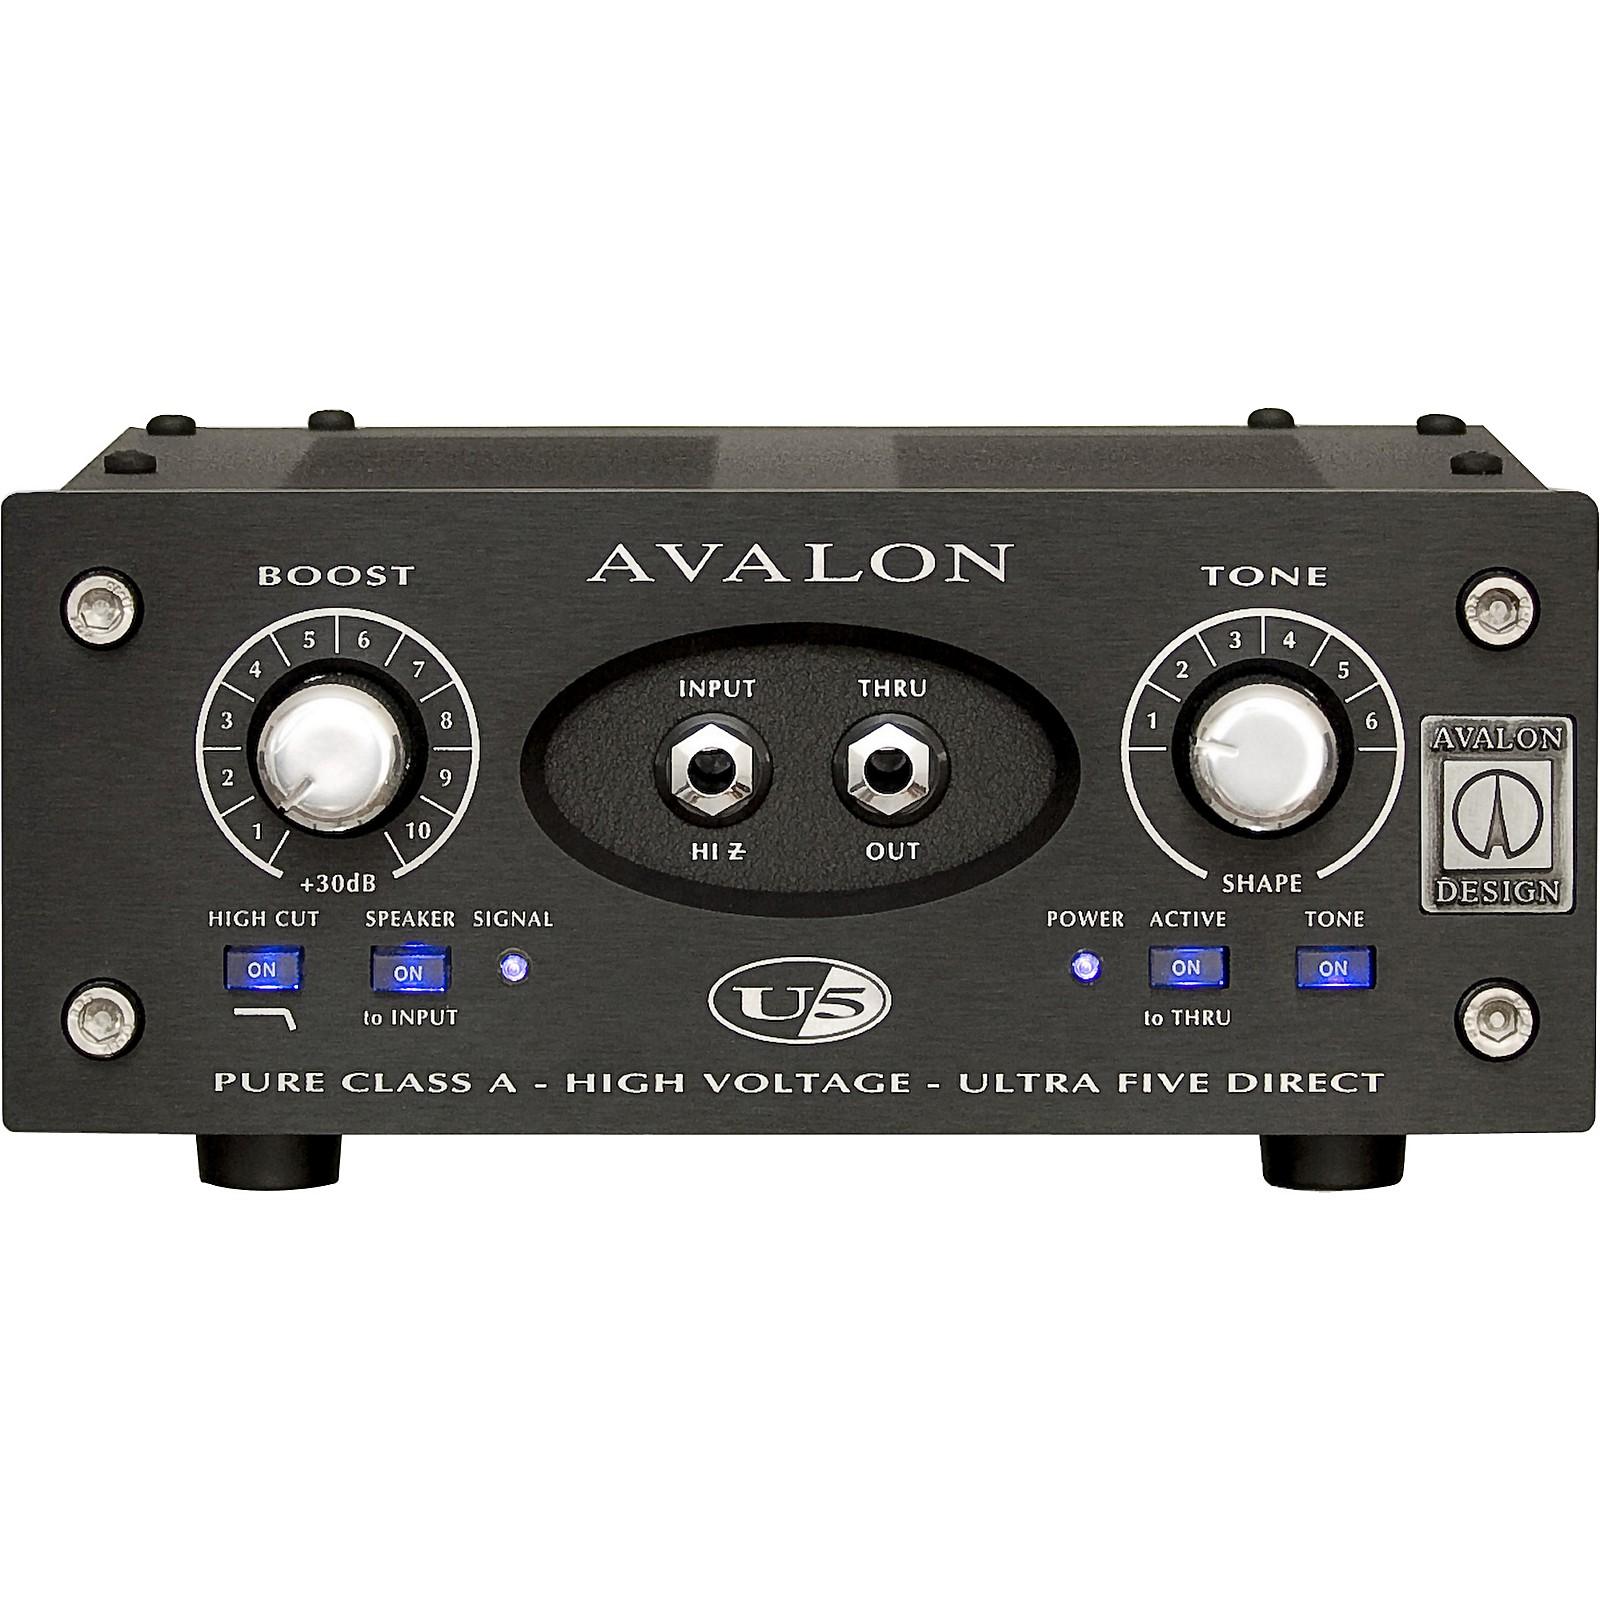 Avalon U5 Direct Box Instrument Preamplifier - 15th Anniversary